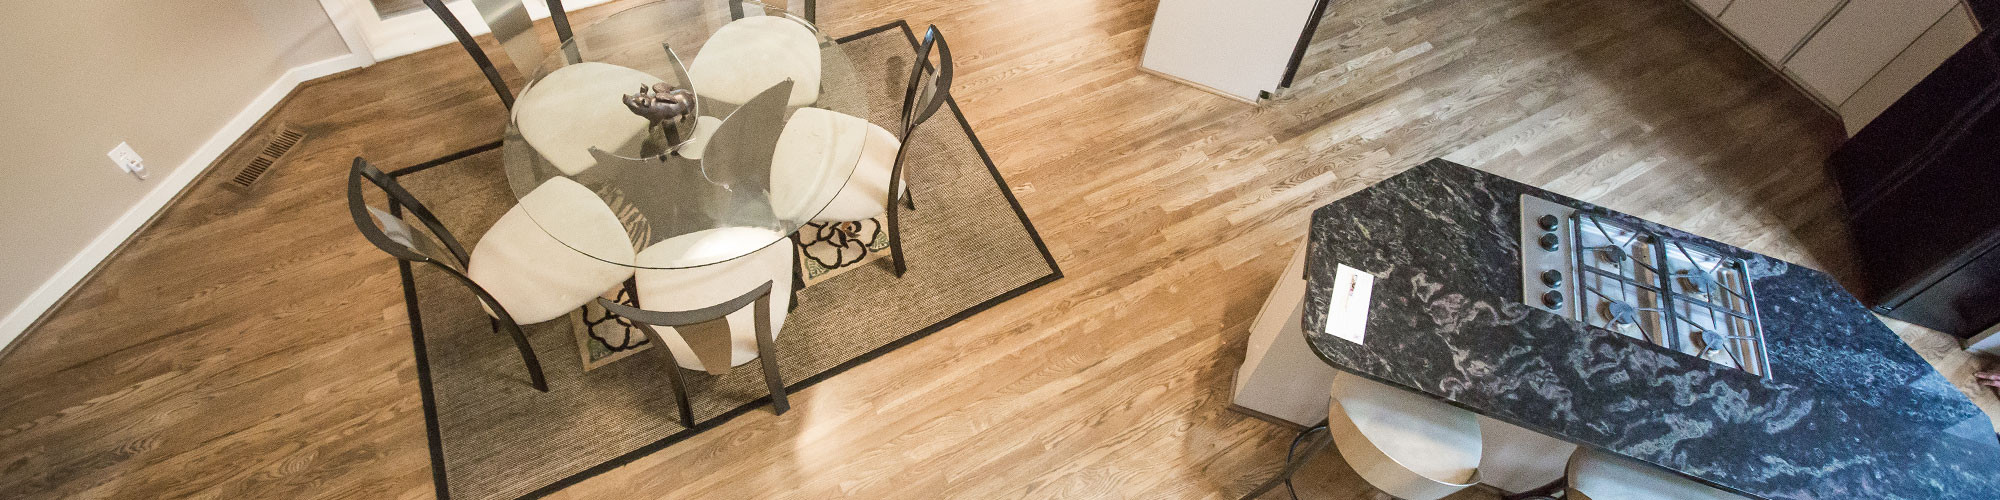 hardwood floor refinishing kansas city of premier hardwood floors kansas city amazing hardwood flooring kansas in rippnfinish hardwood floor refinishing kansas city s